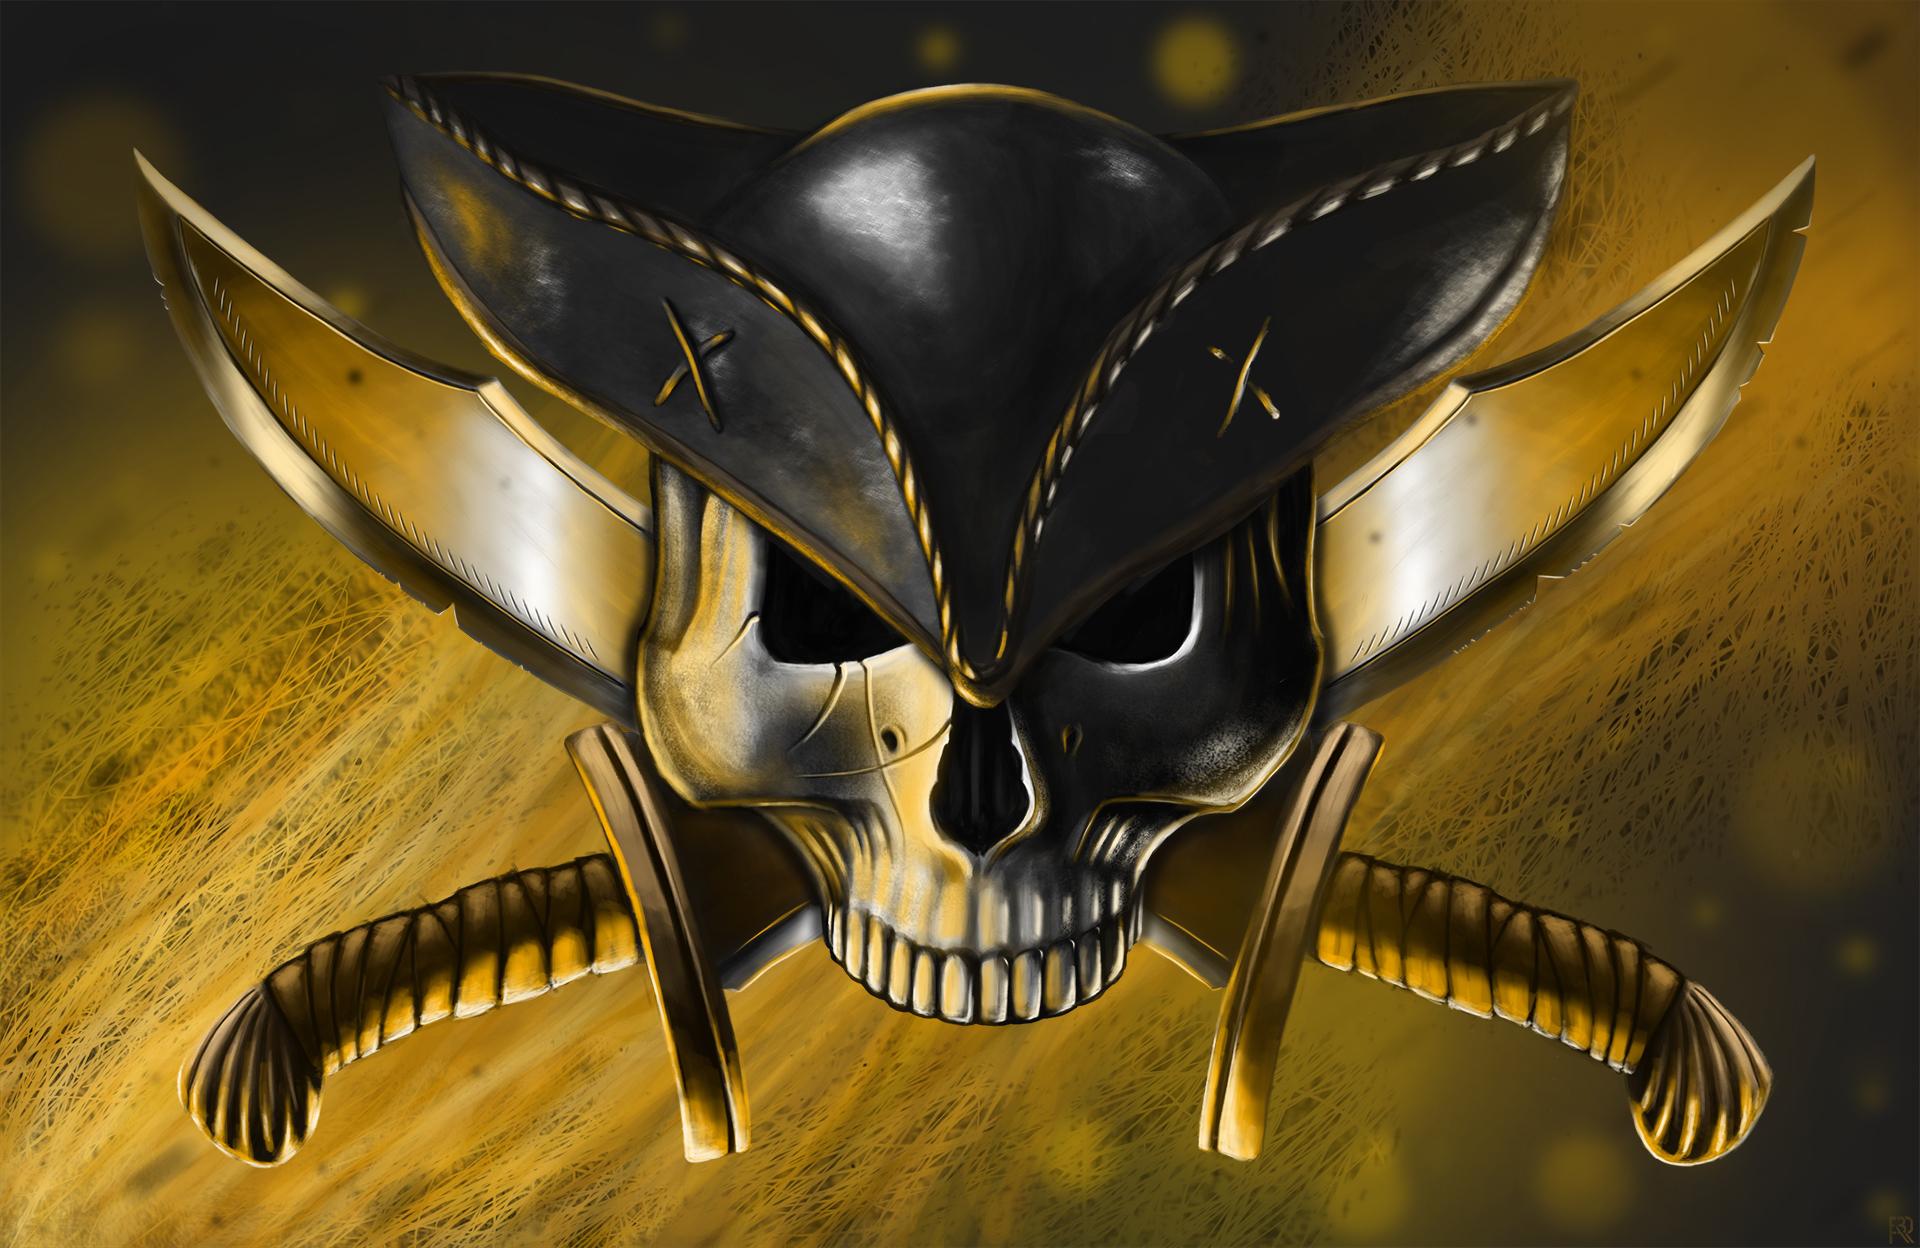 art pirate skull hat guns knives jolly roger wallpaper 1920x1248 178926 wallpaperup. Black Bedroom Furniture Sets. Home Design Ideas